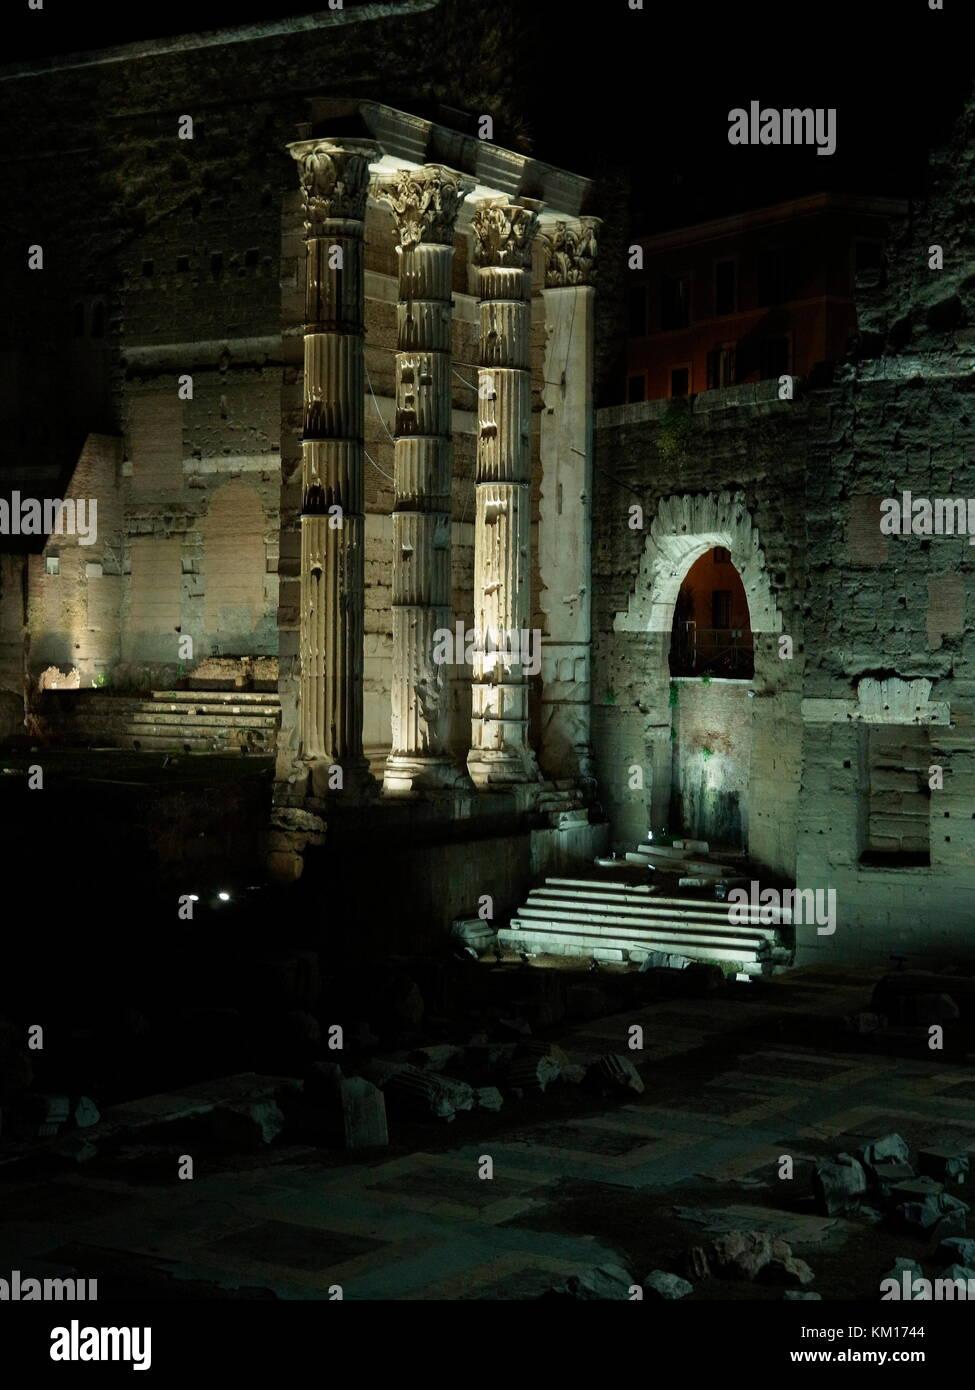 AJAXNETPHOTO. 2015. ROME, ITALY. - ROMAN RUINS - FORUM OF AUGUSTUS, COMMEMORATES BATTLE AT PHILIPPI, LOCATED NEAR THE PIAZZO FORO DEL TRAIANO.  PHOTO:JONATHAN EASTLAND/AJAX REF:GXR151012_5703 Stock Photo